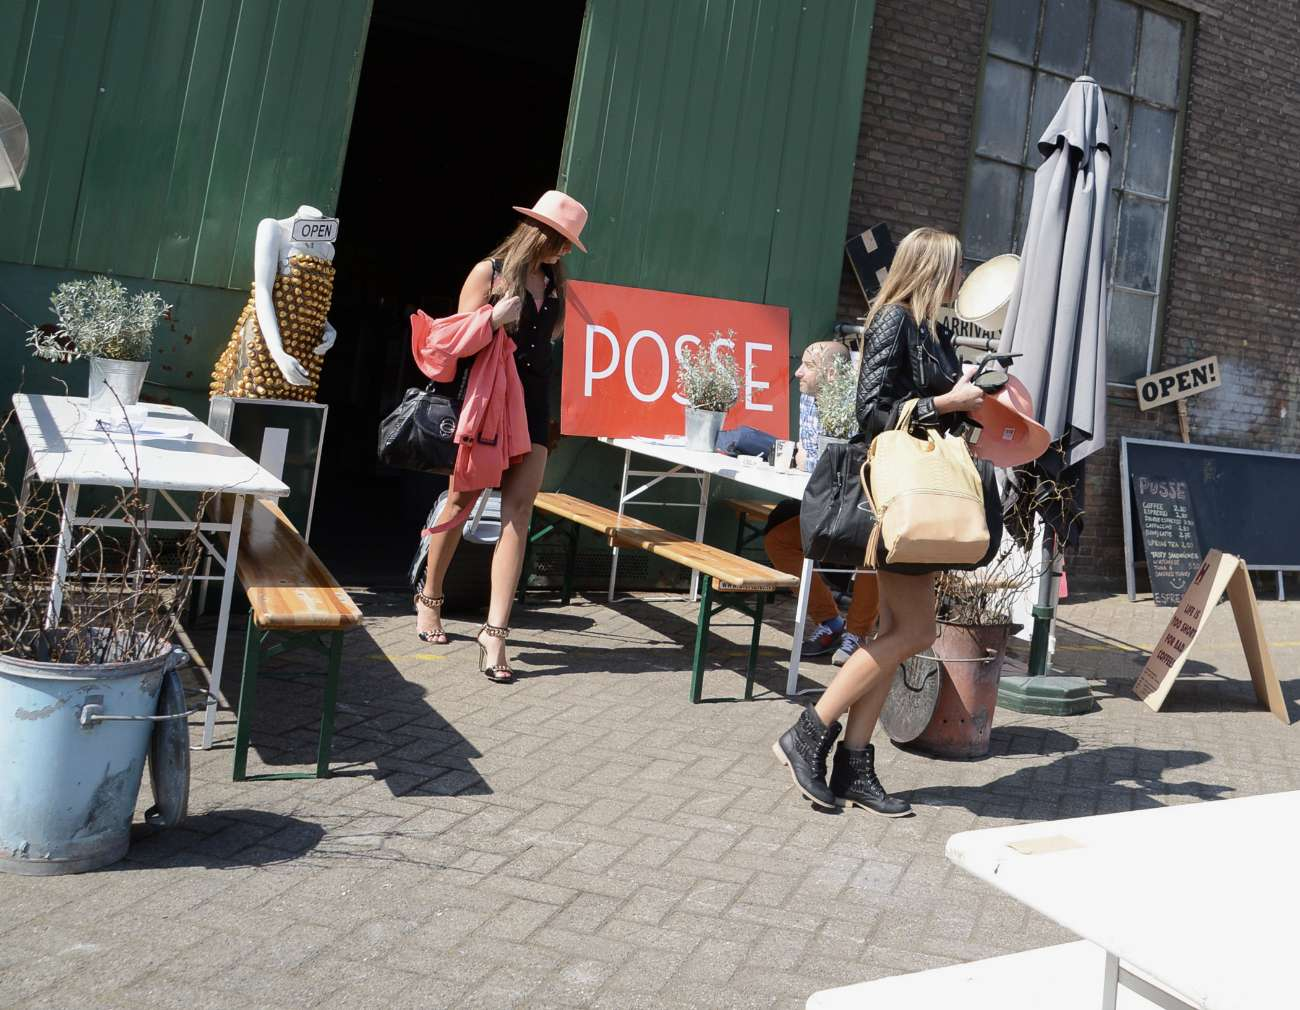 Models in der Posse Espresso Bar in Rotterdam